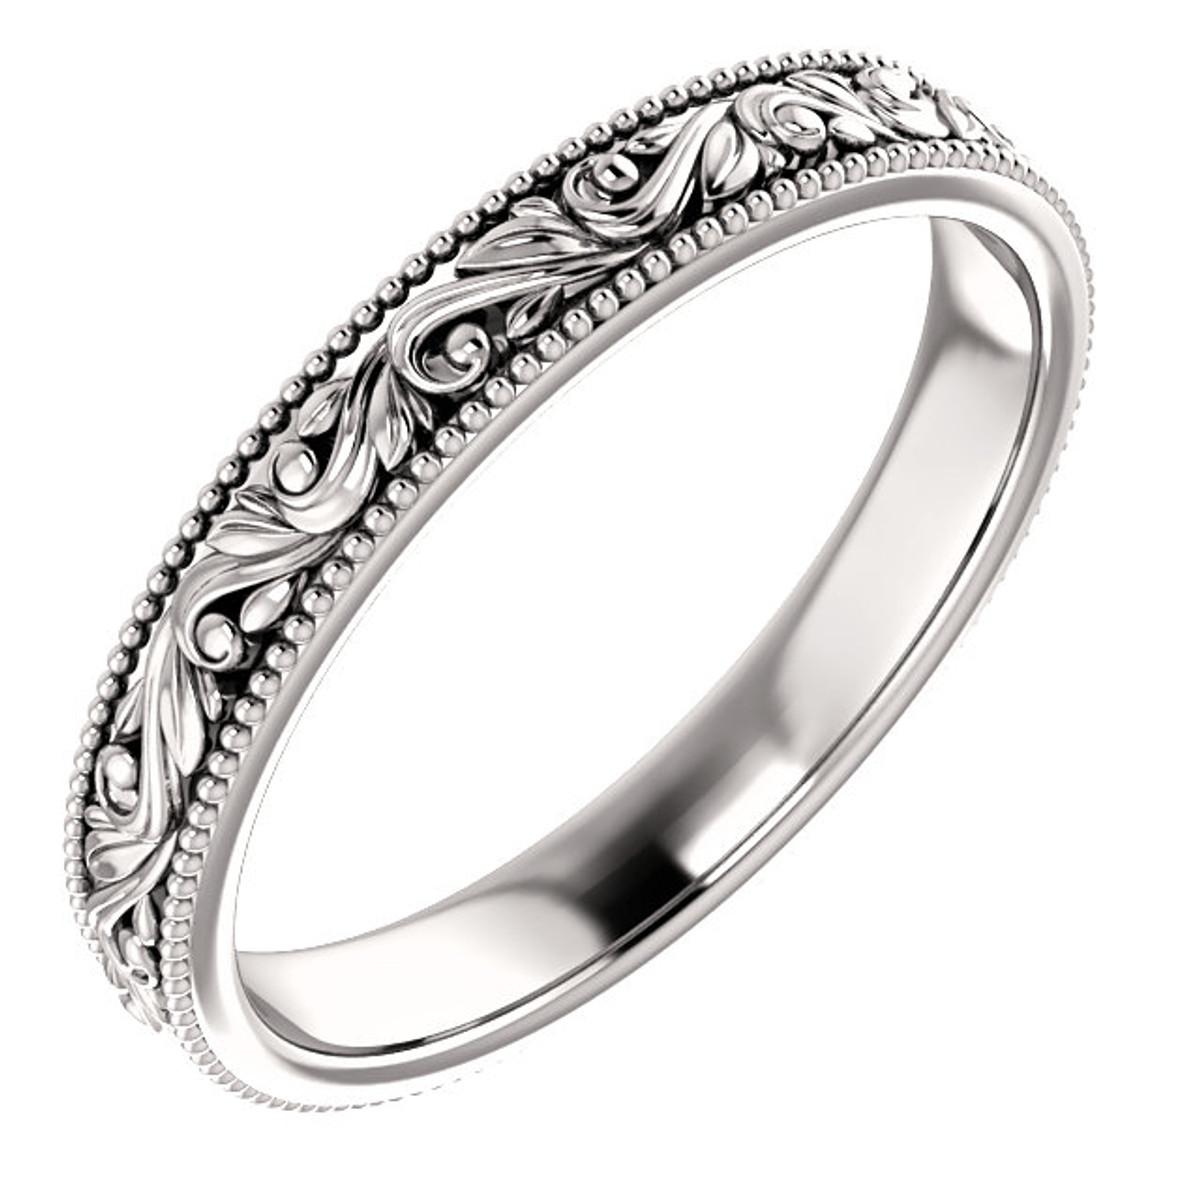 White Gold Engraved Wedding RIng